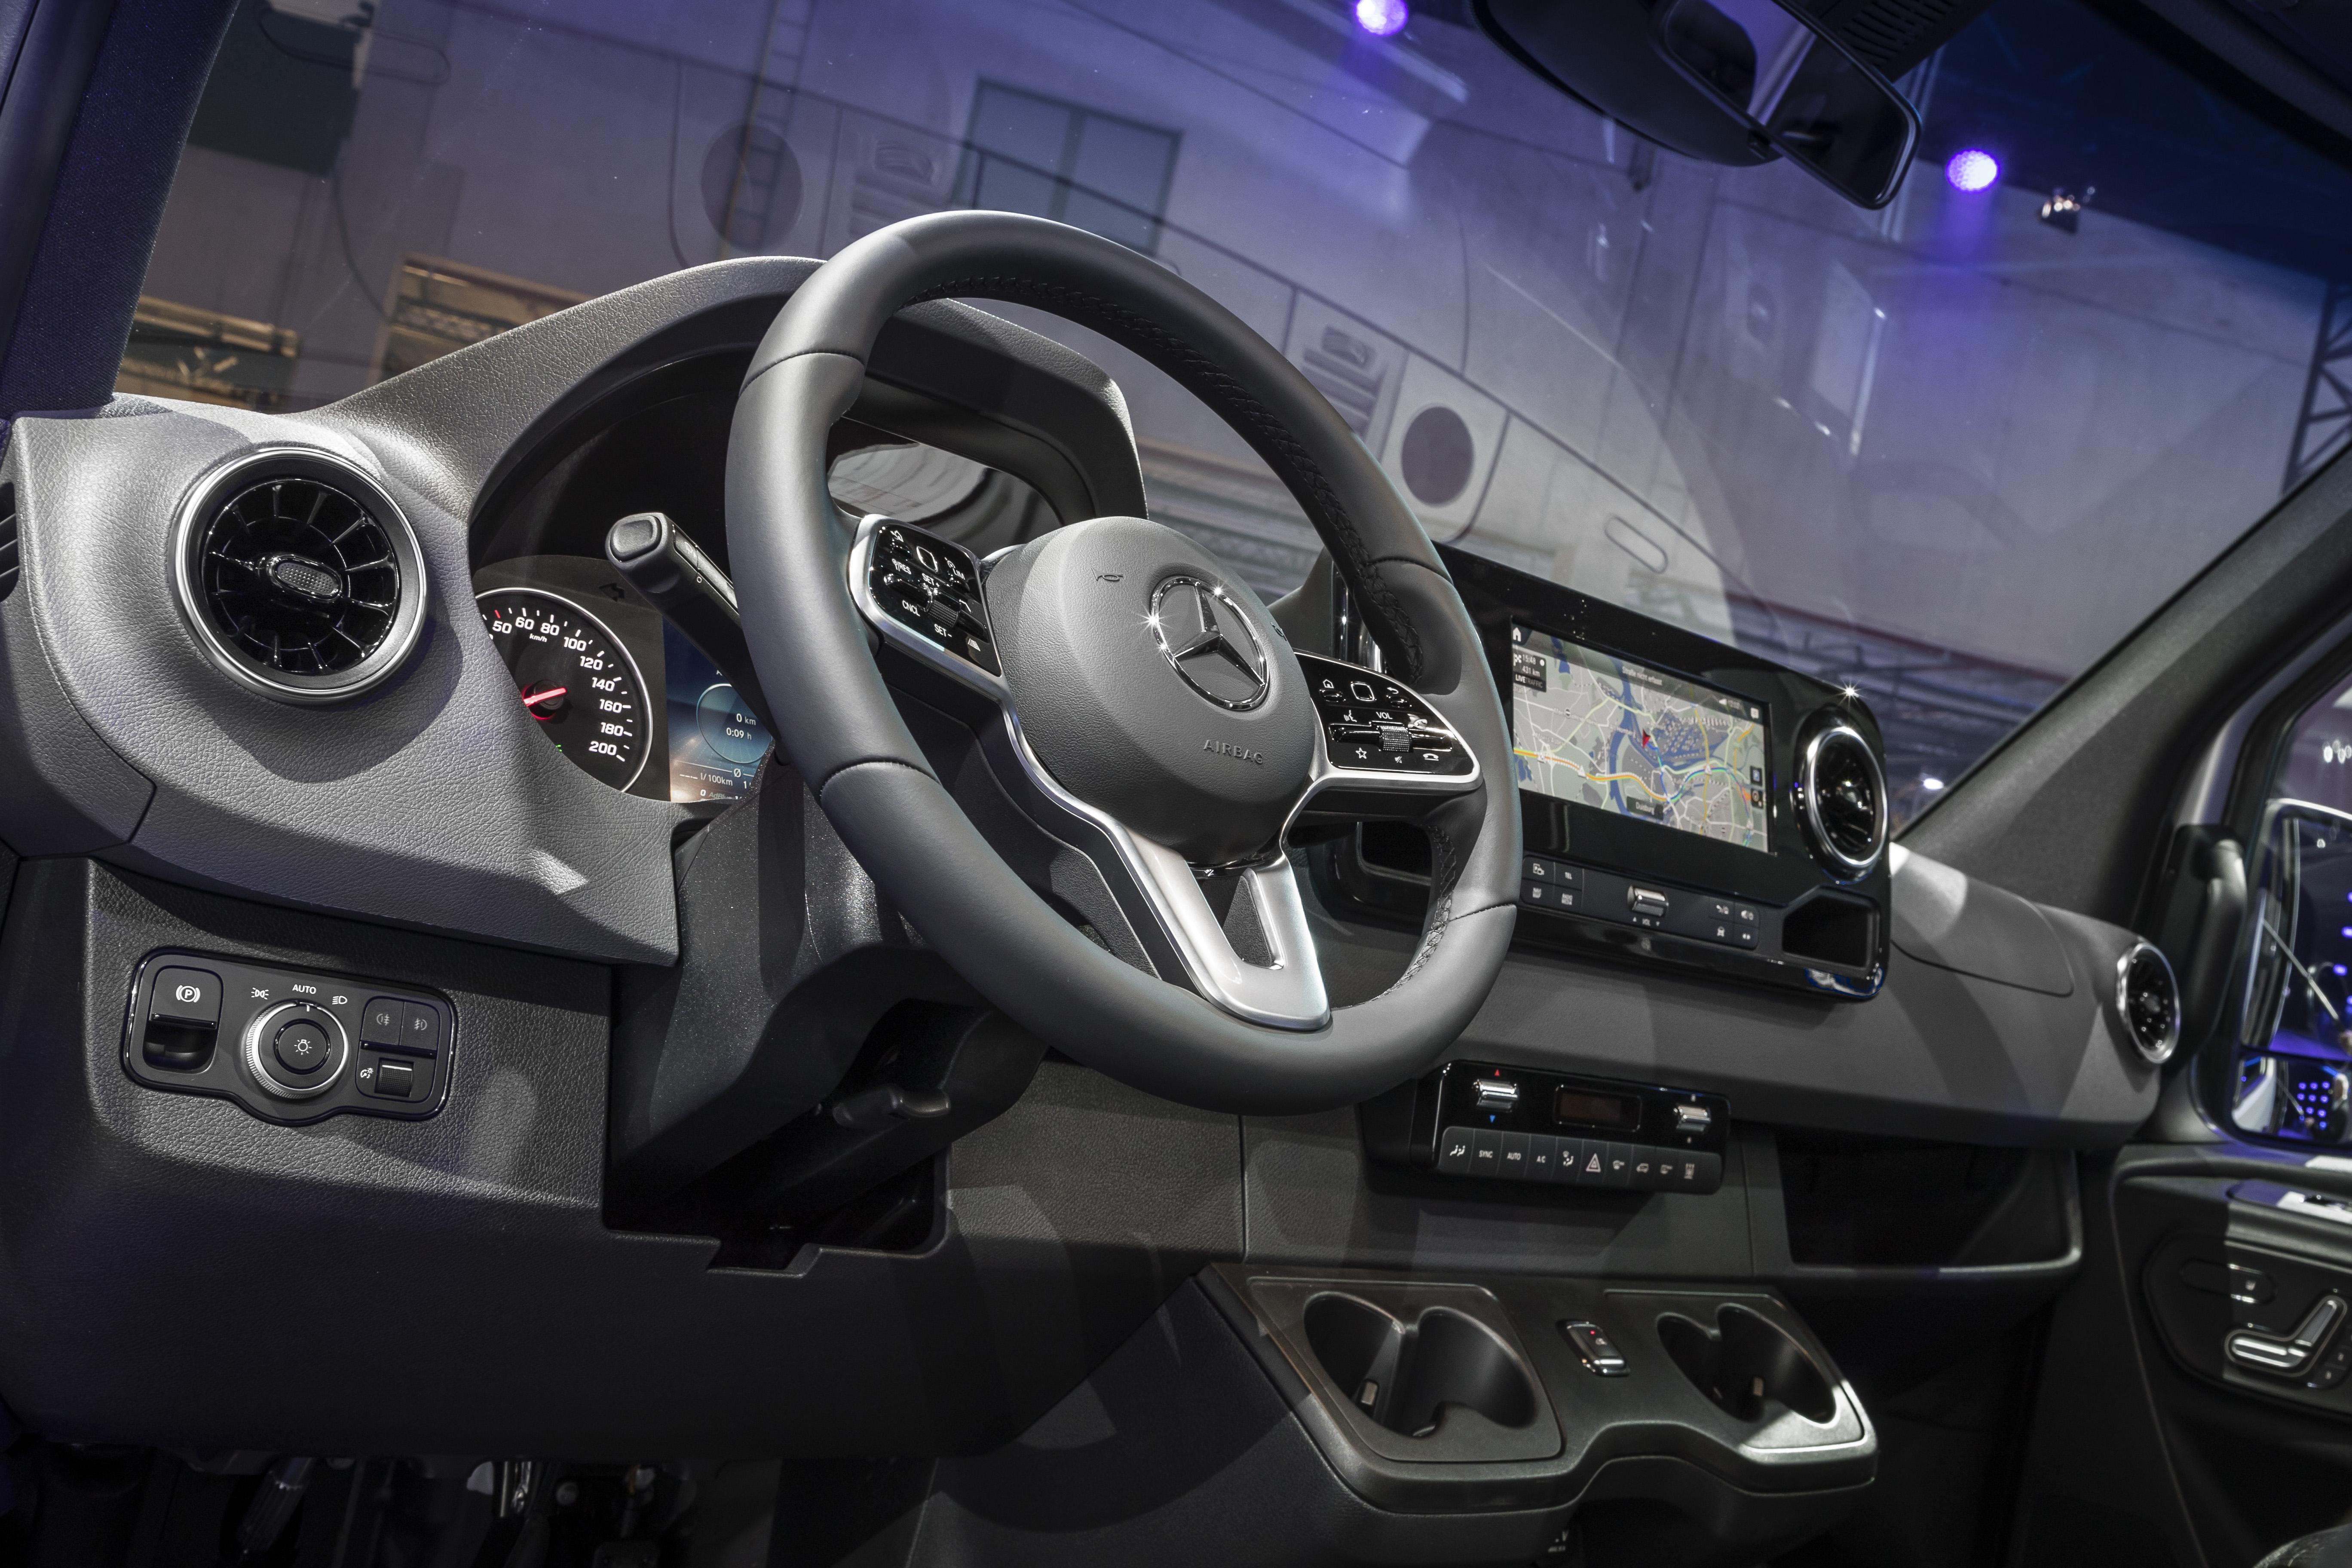 Weltpremiere Mercedes-Benz Sprinter, Duisburg 2018 // World premiere Mercedes-Benz Sprinter, Duisburg 2018